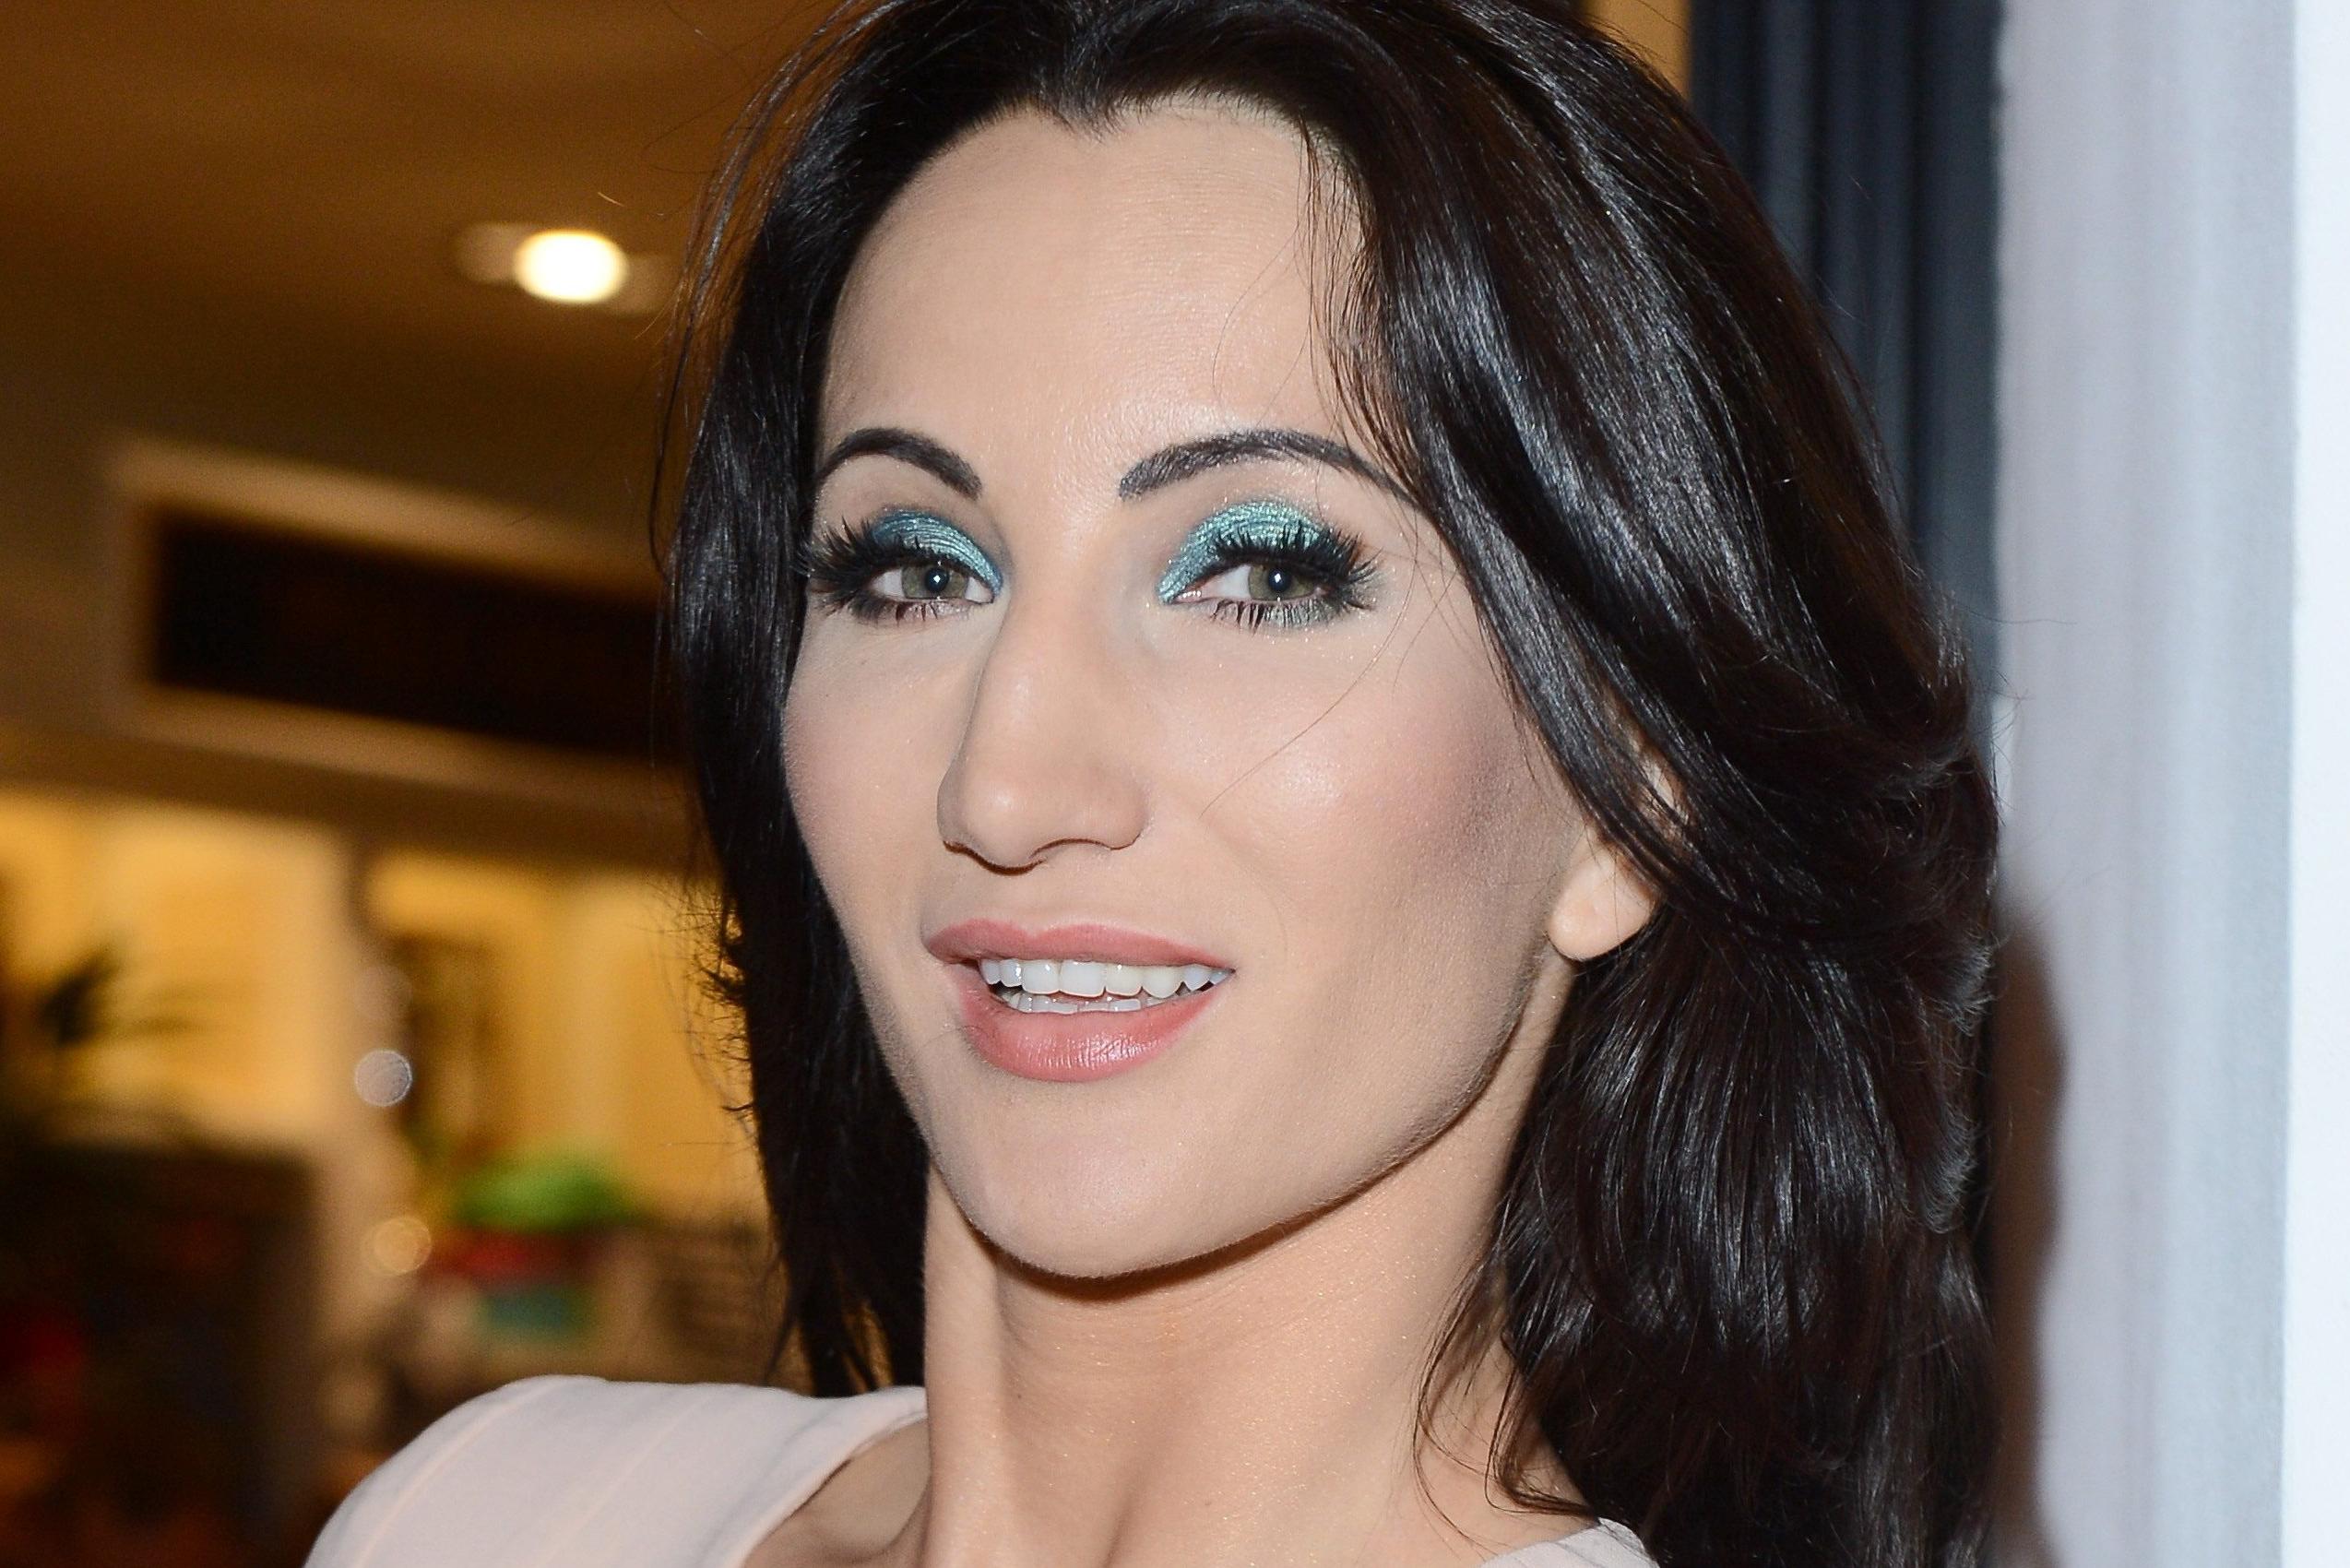 Hacked Maria Eugenia Suarez nude photos 2019